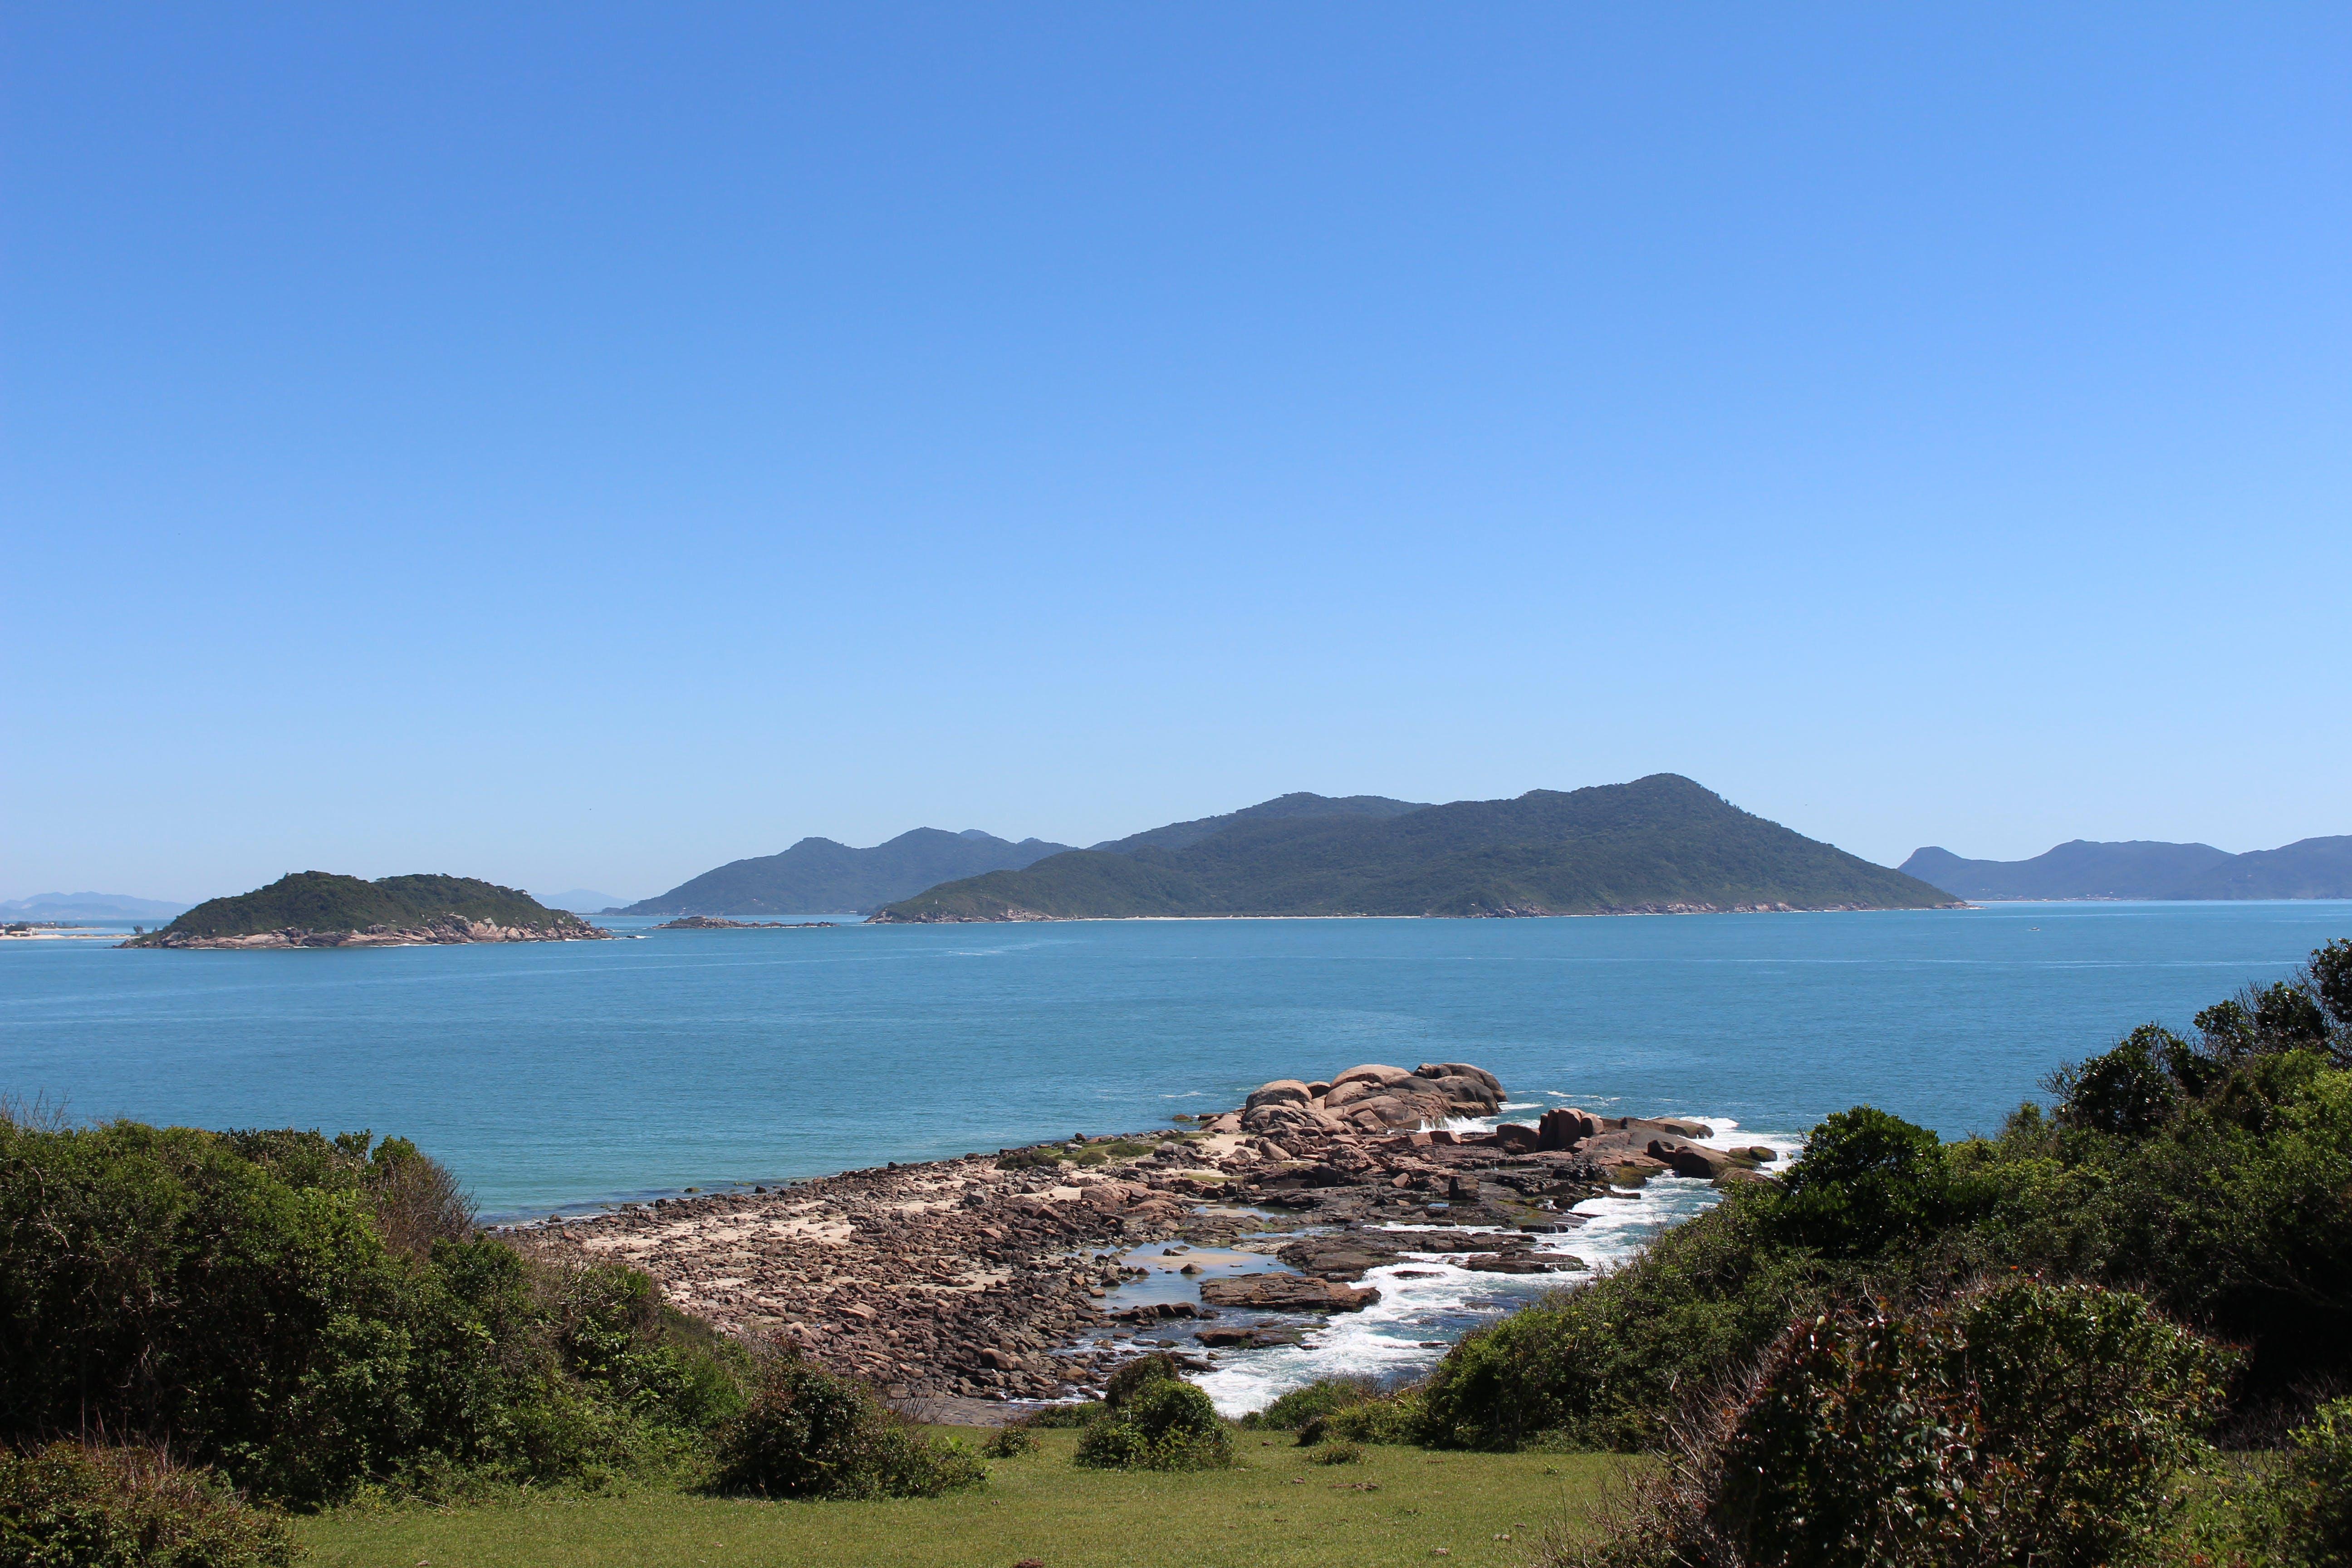 Fotos de stock gratuitas de agua, arbustos, bahía, cielo azul